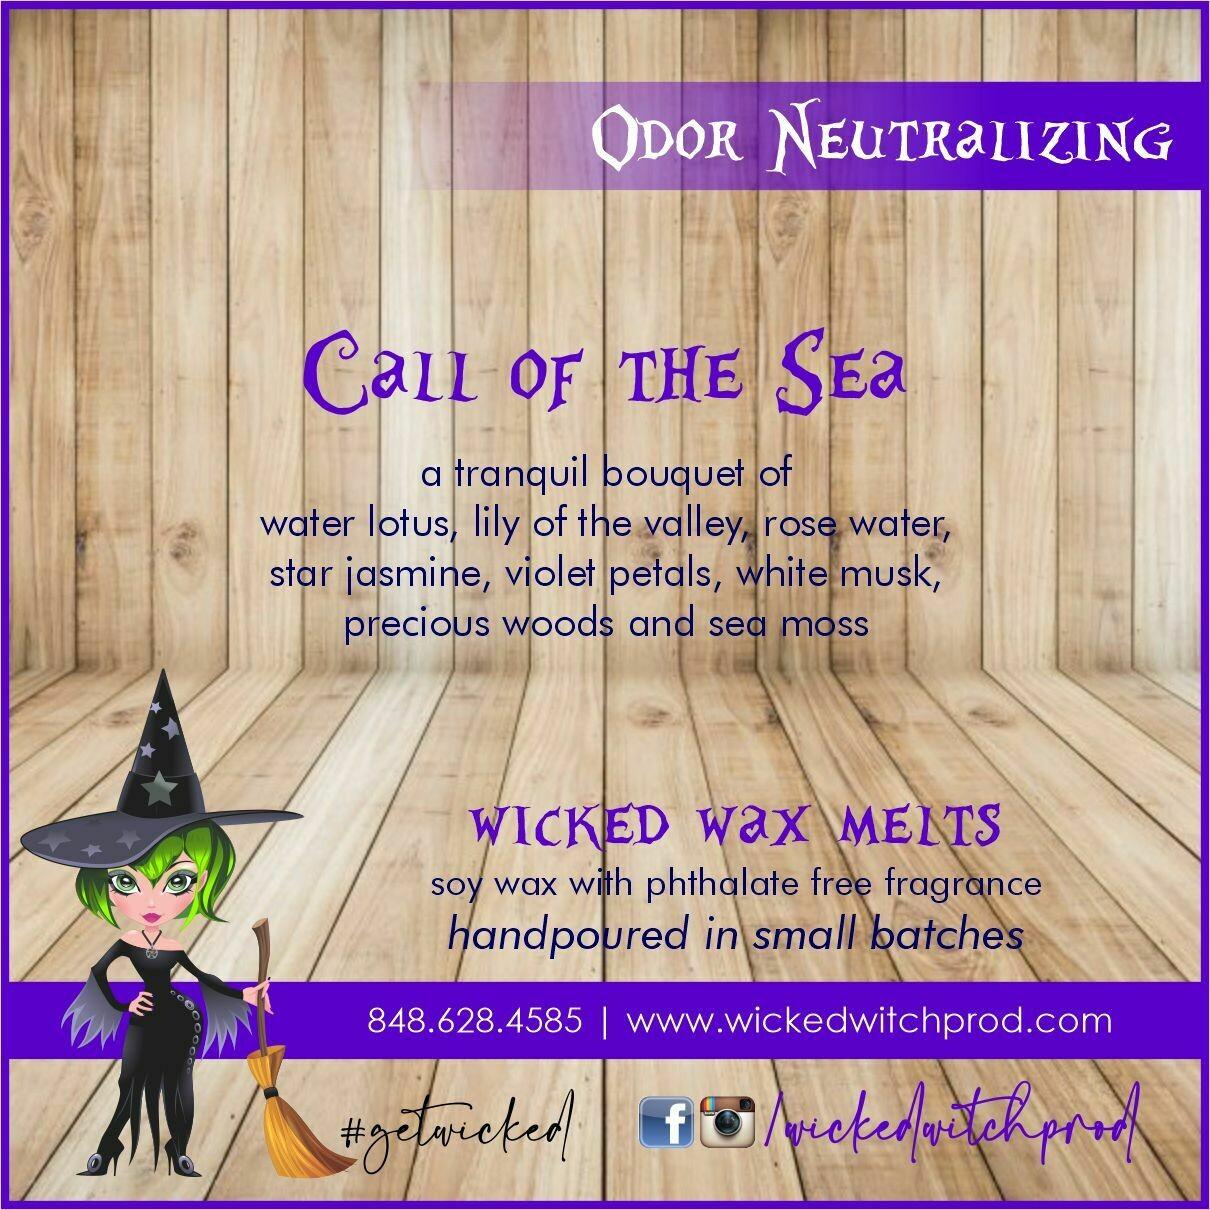 Call of the Sea Odor Neutralizing Wax Melt